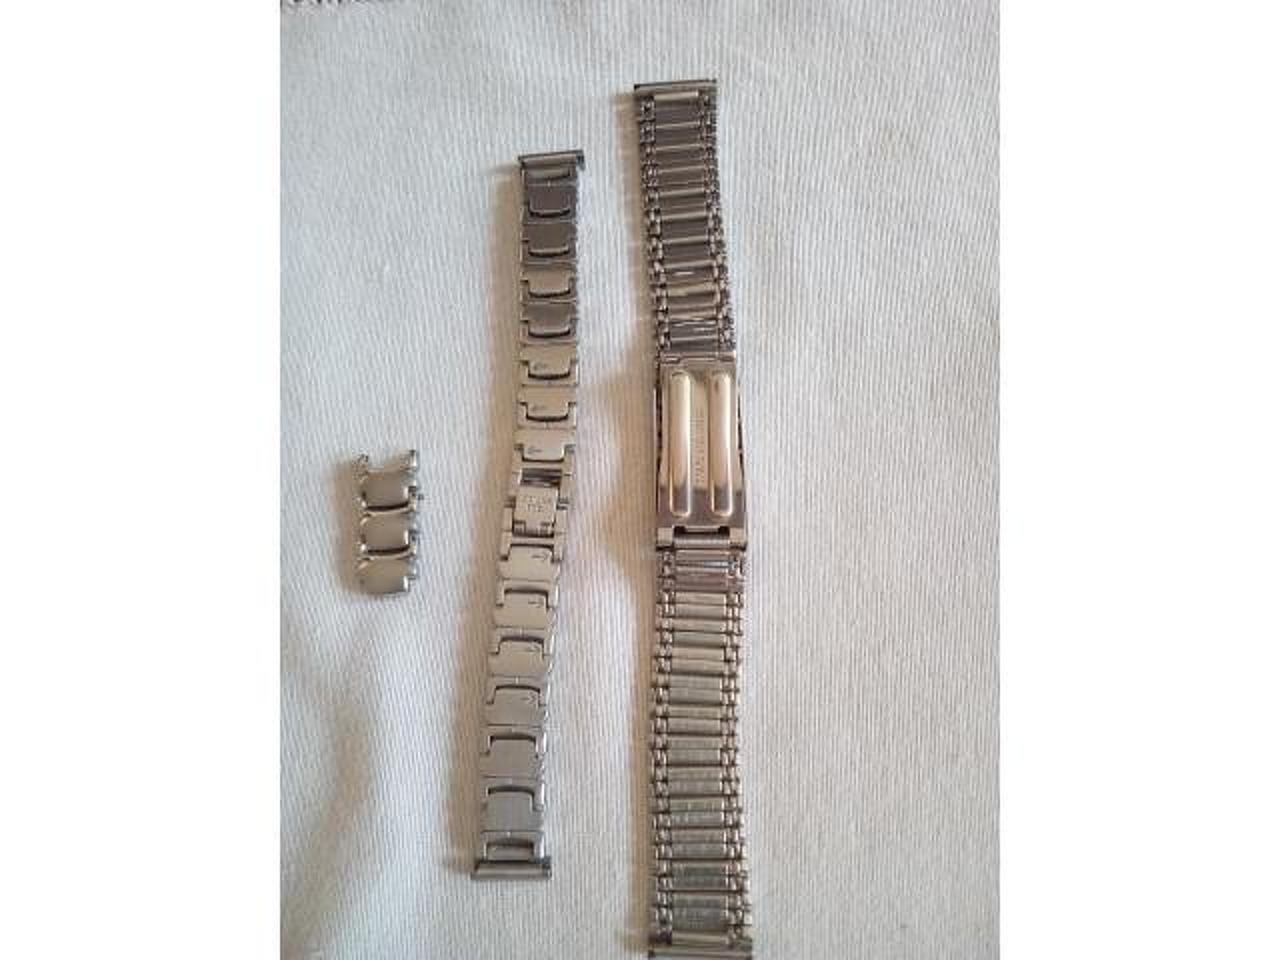 Braceletes para relógios, ajustáveis. - 3/3